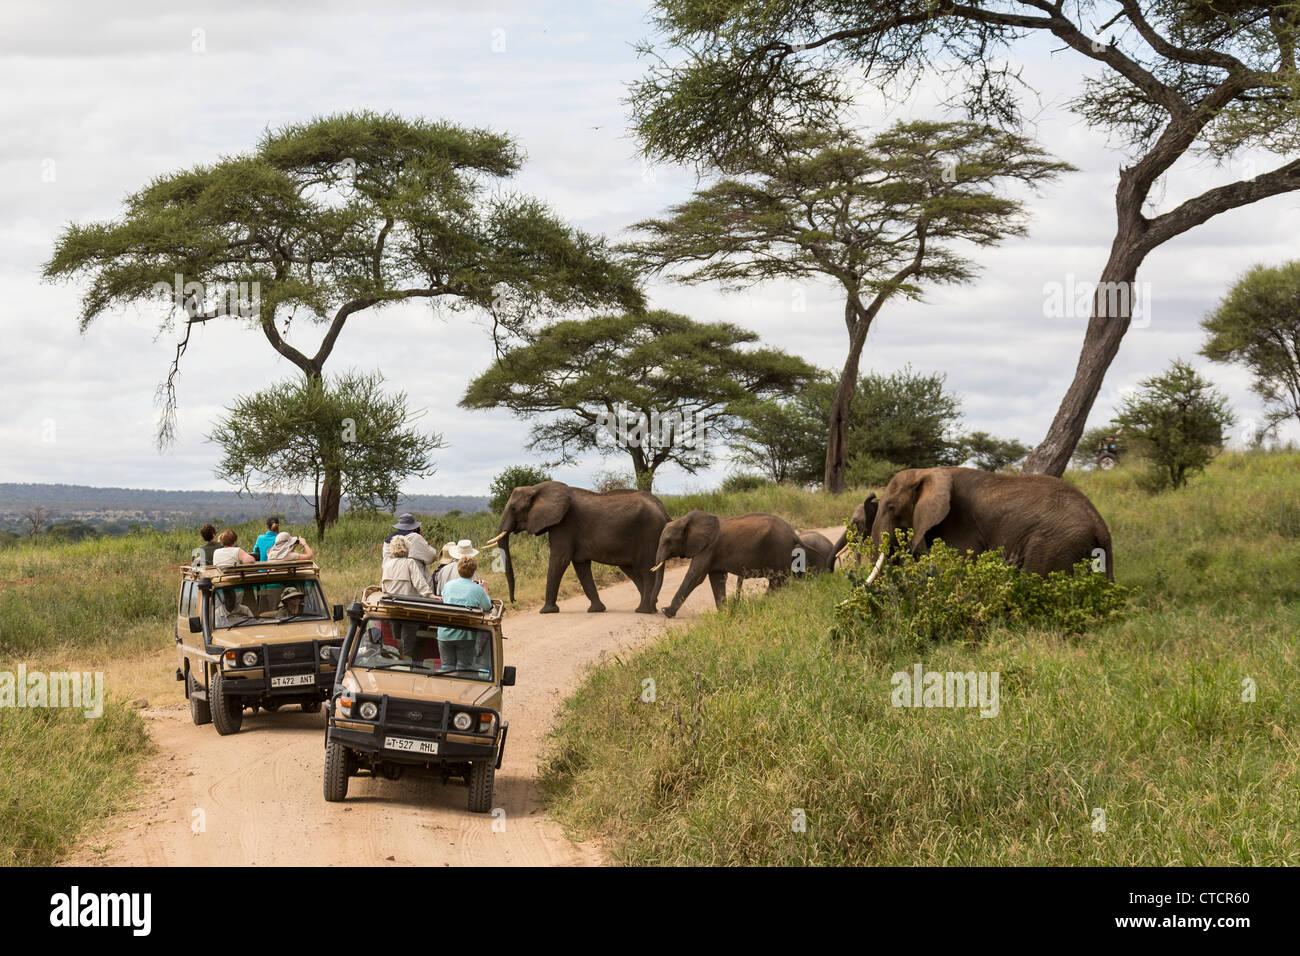 Safari group watching elephants crossing a road - Stock Image